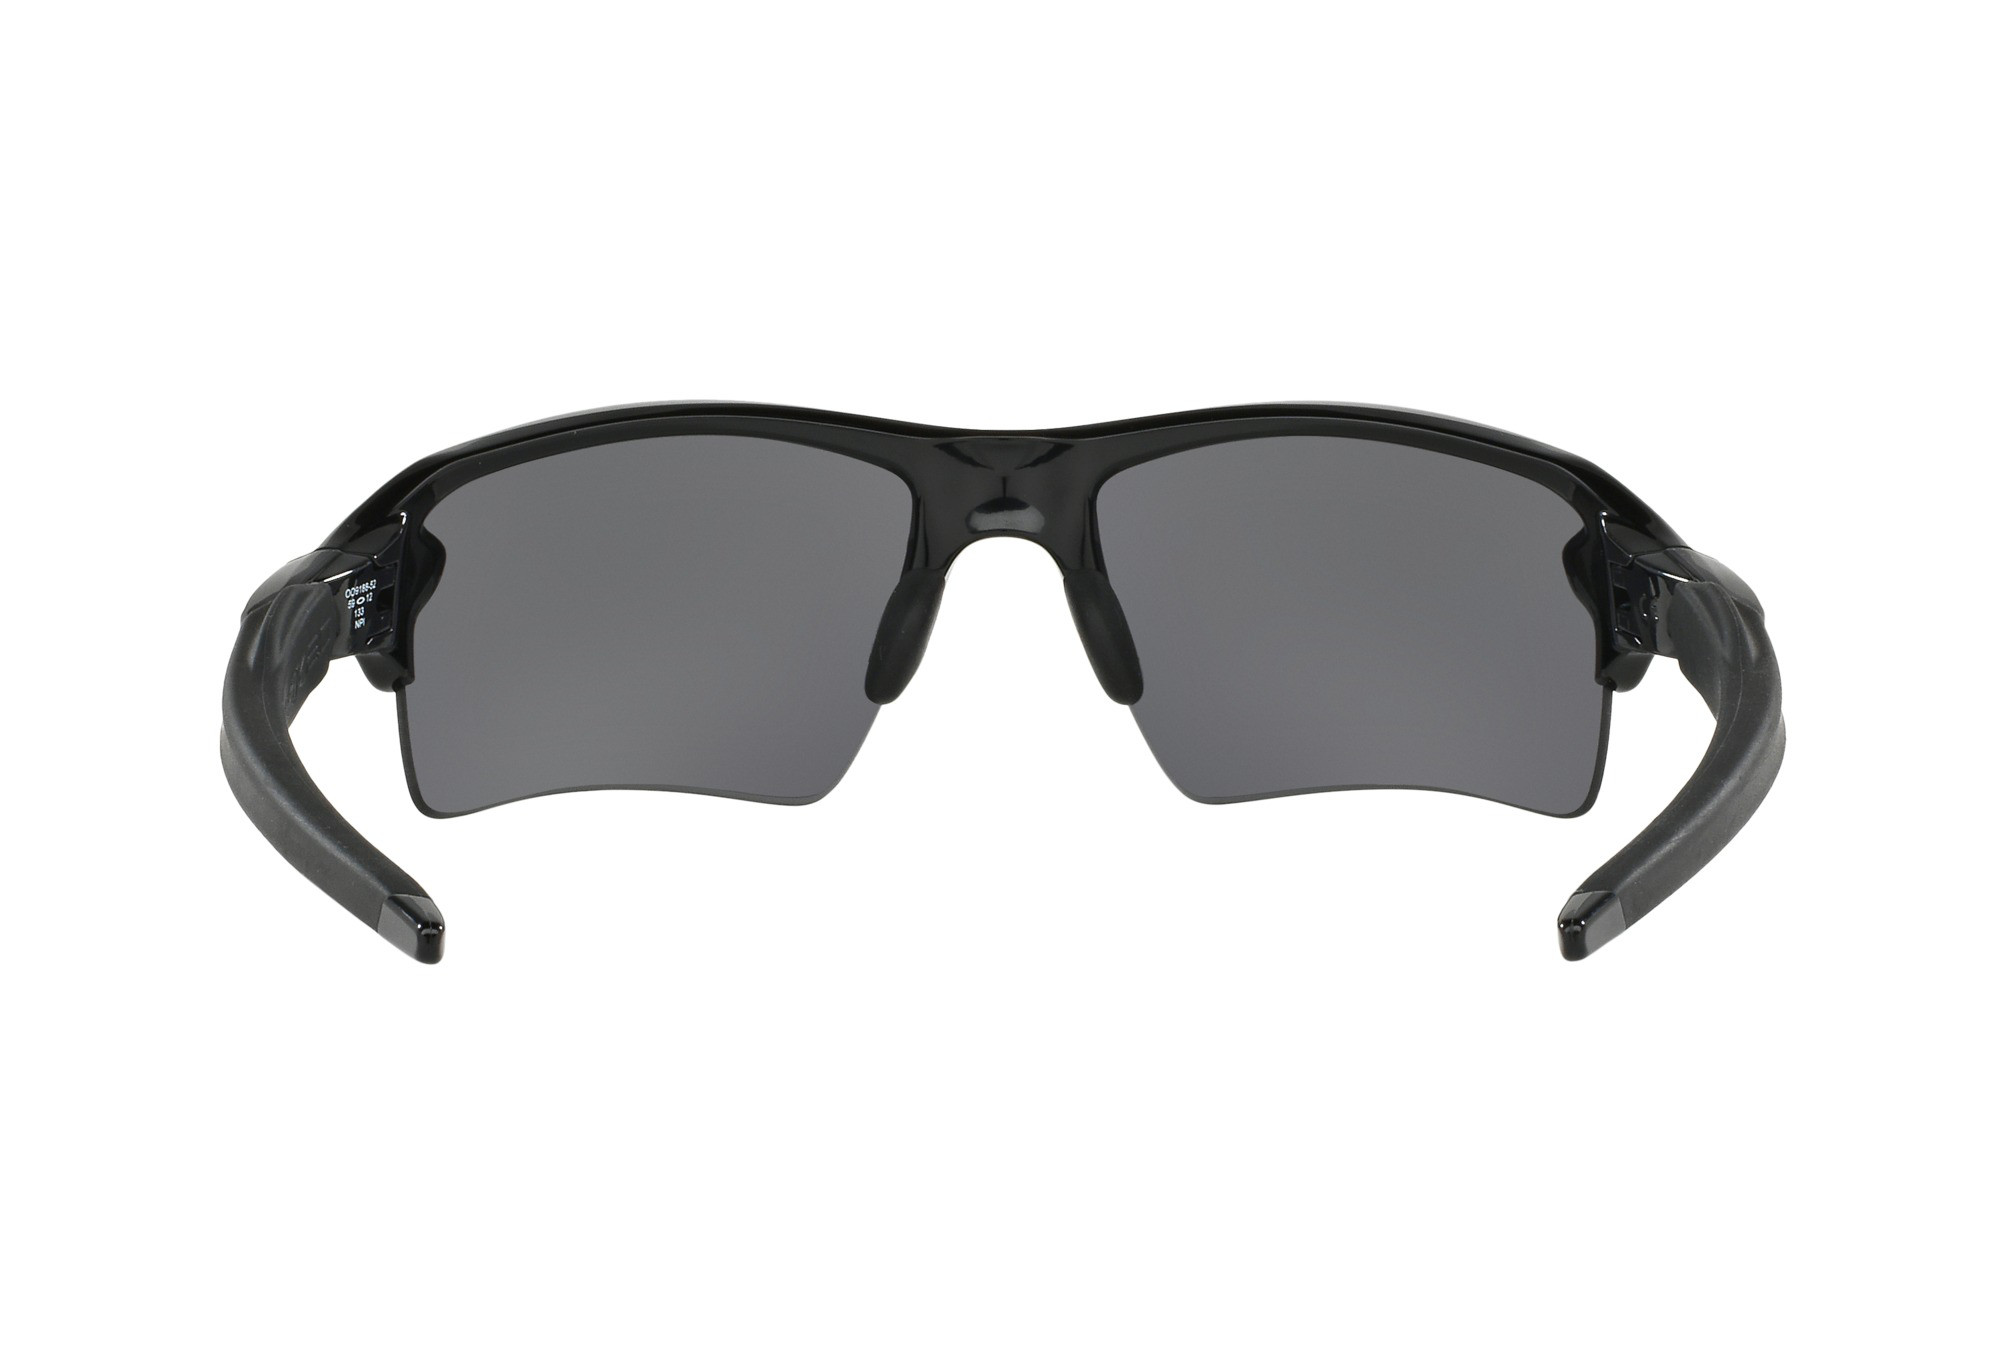 c3ccb2e049 OAKLEY Lunettes FLAK 2.0 XL Polished Black   Black Iridium Ref OO9188-52